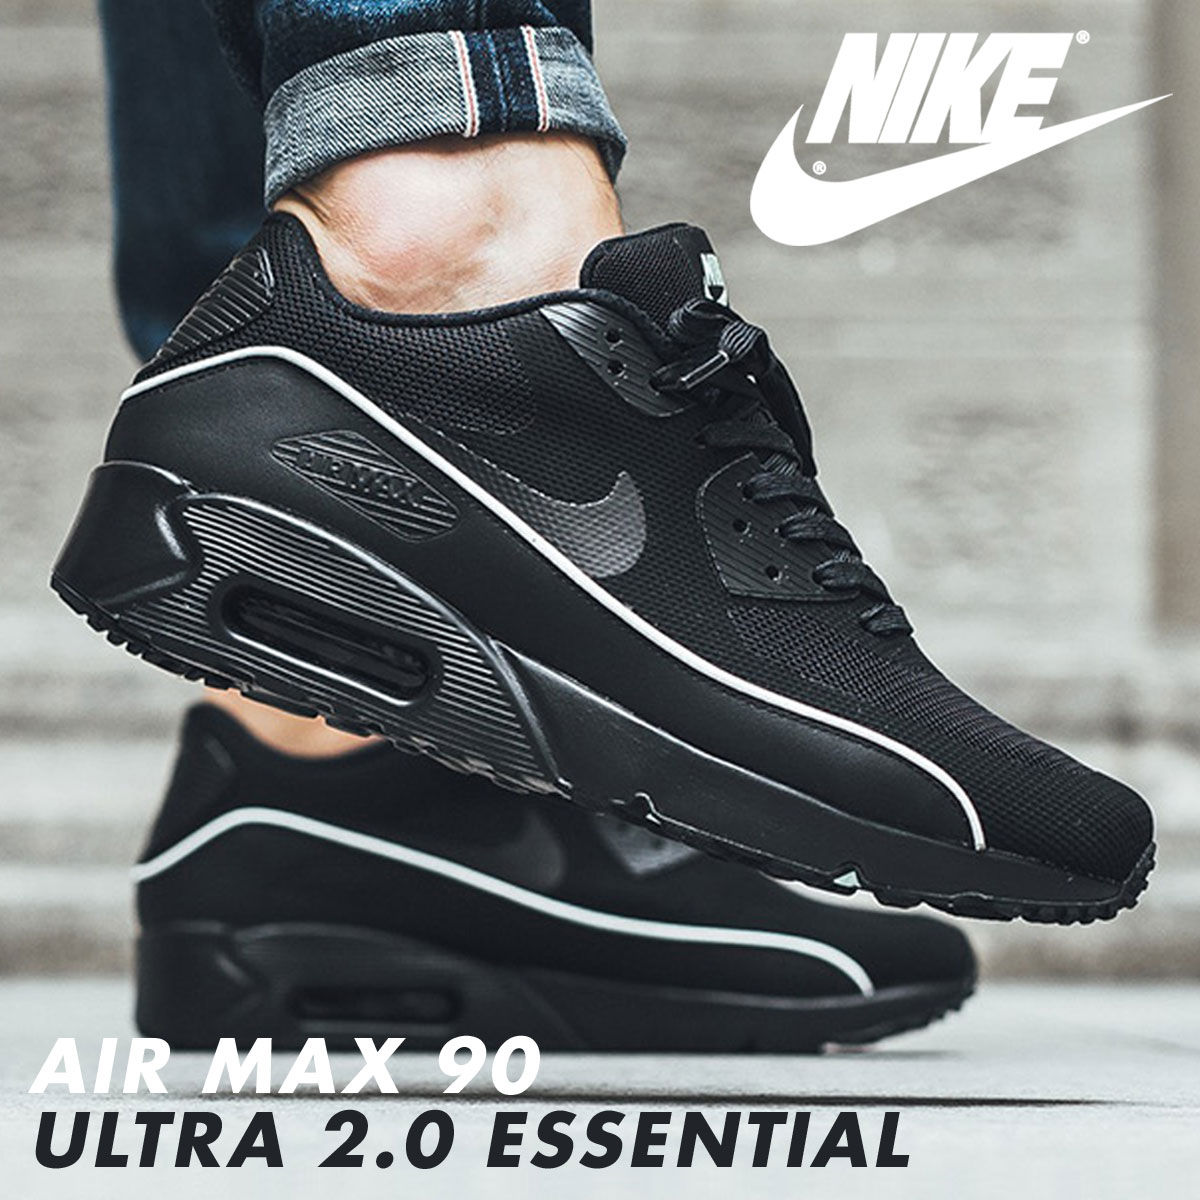 detailing 8dce3 3d7b7 NIKE Kie Ney AMAX 90 essential ultra sneakers AIR MAX 90 ULTRA 2.0 ESSENTIAL  875,695-009 men s shoes black  9 4 Shinnyu load   179